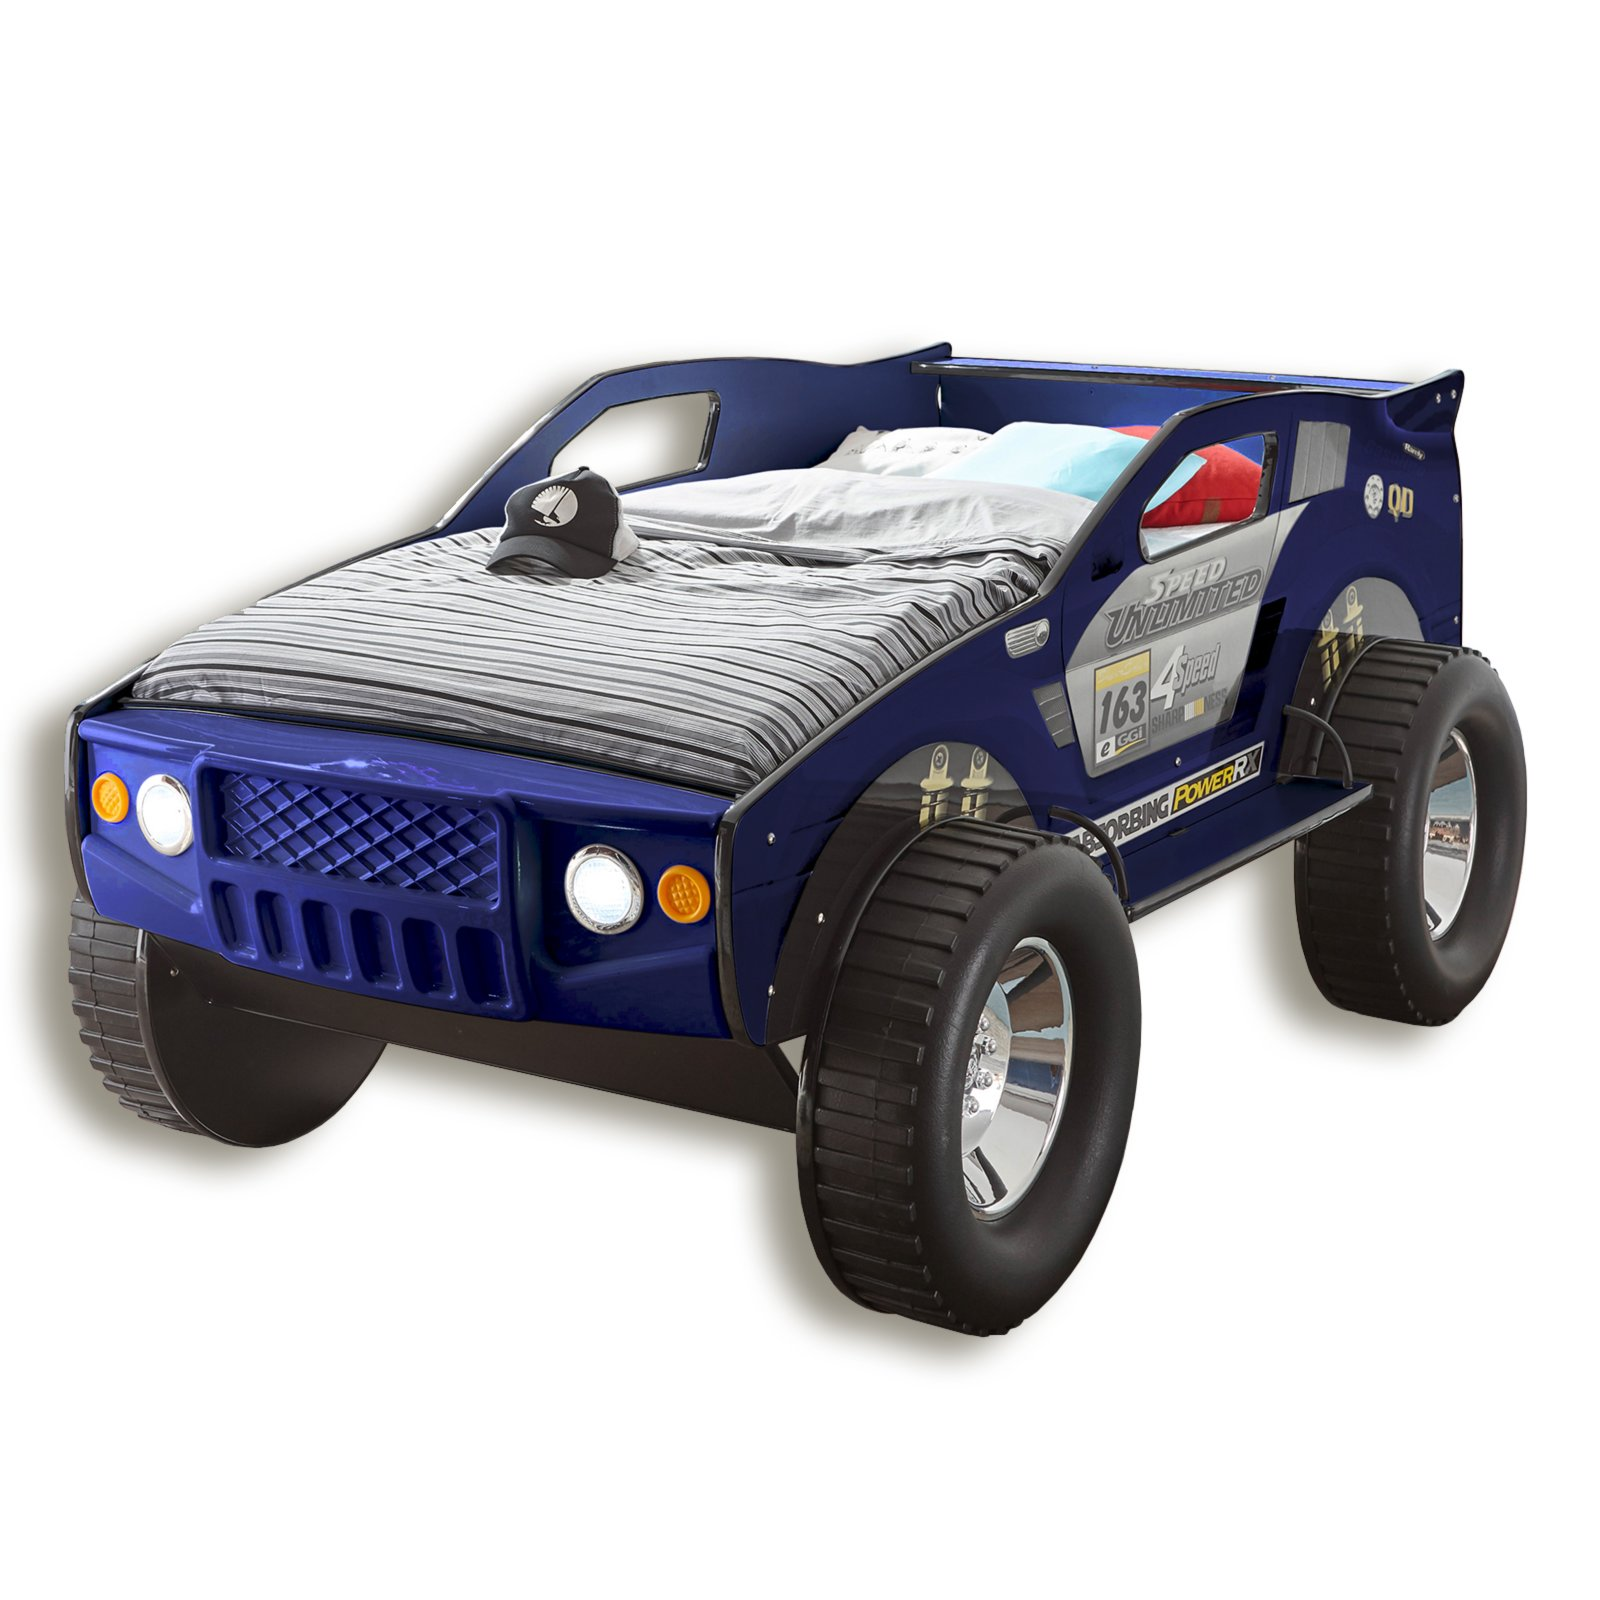 autobett jeep blau mit beleuchtung 90x200 cm jugendbetten kinderbetten betten. Black Bedroom Furniture Sets. Home Design Ideas